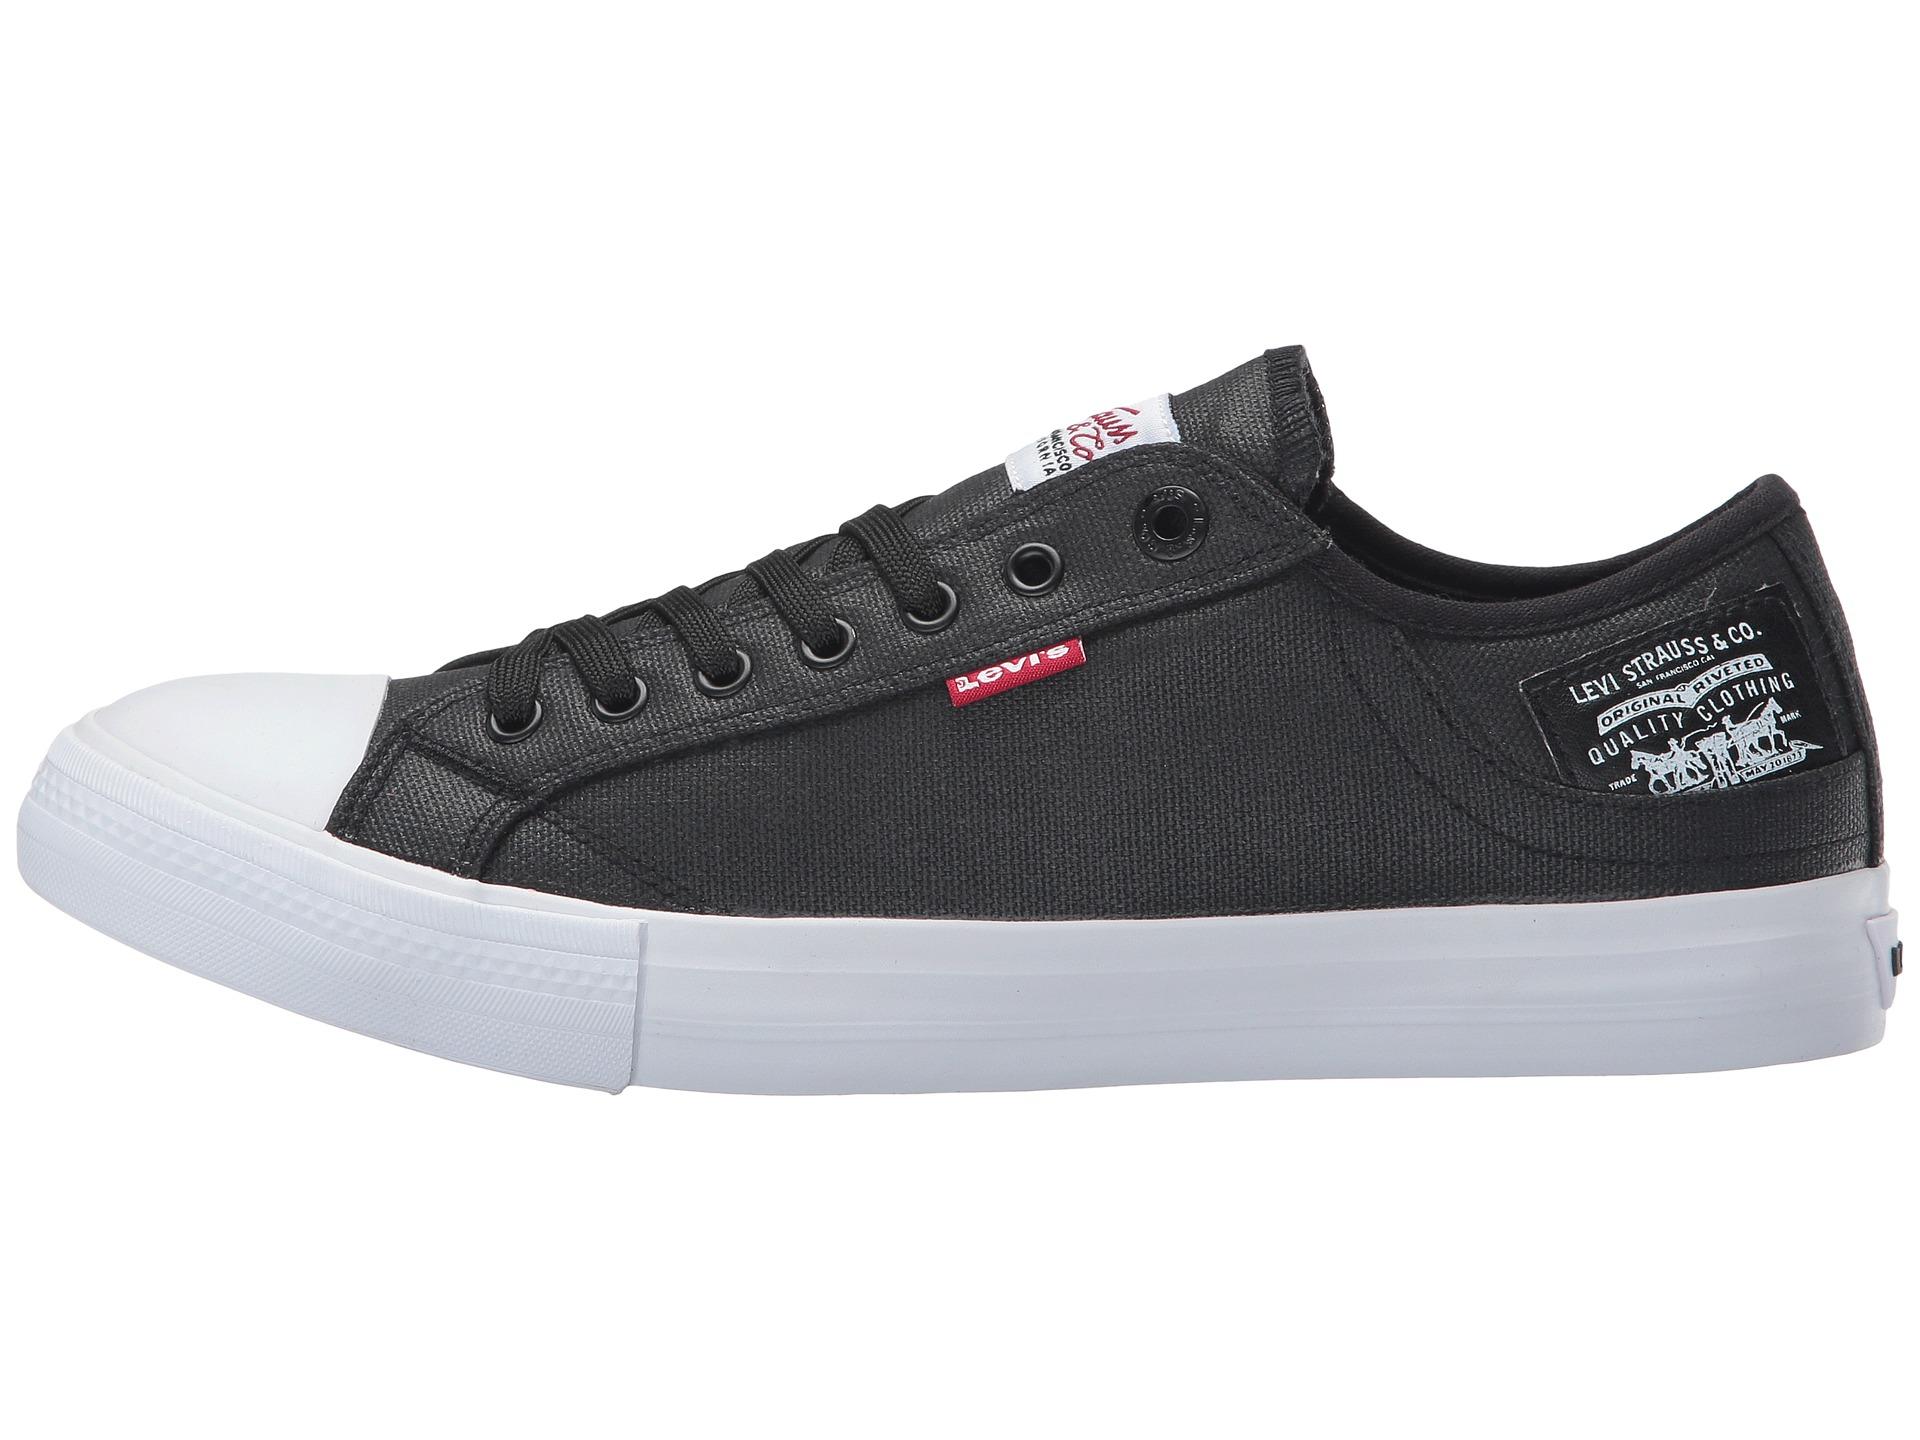 online store 3879e e1fef australia chaussures jordan 6 femmes blanc noir rouge air jordan 30 air  6229a e709d